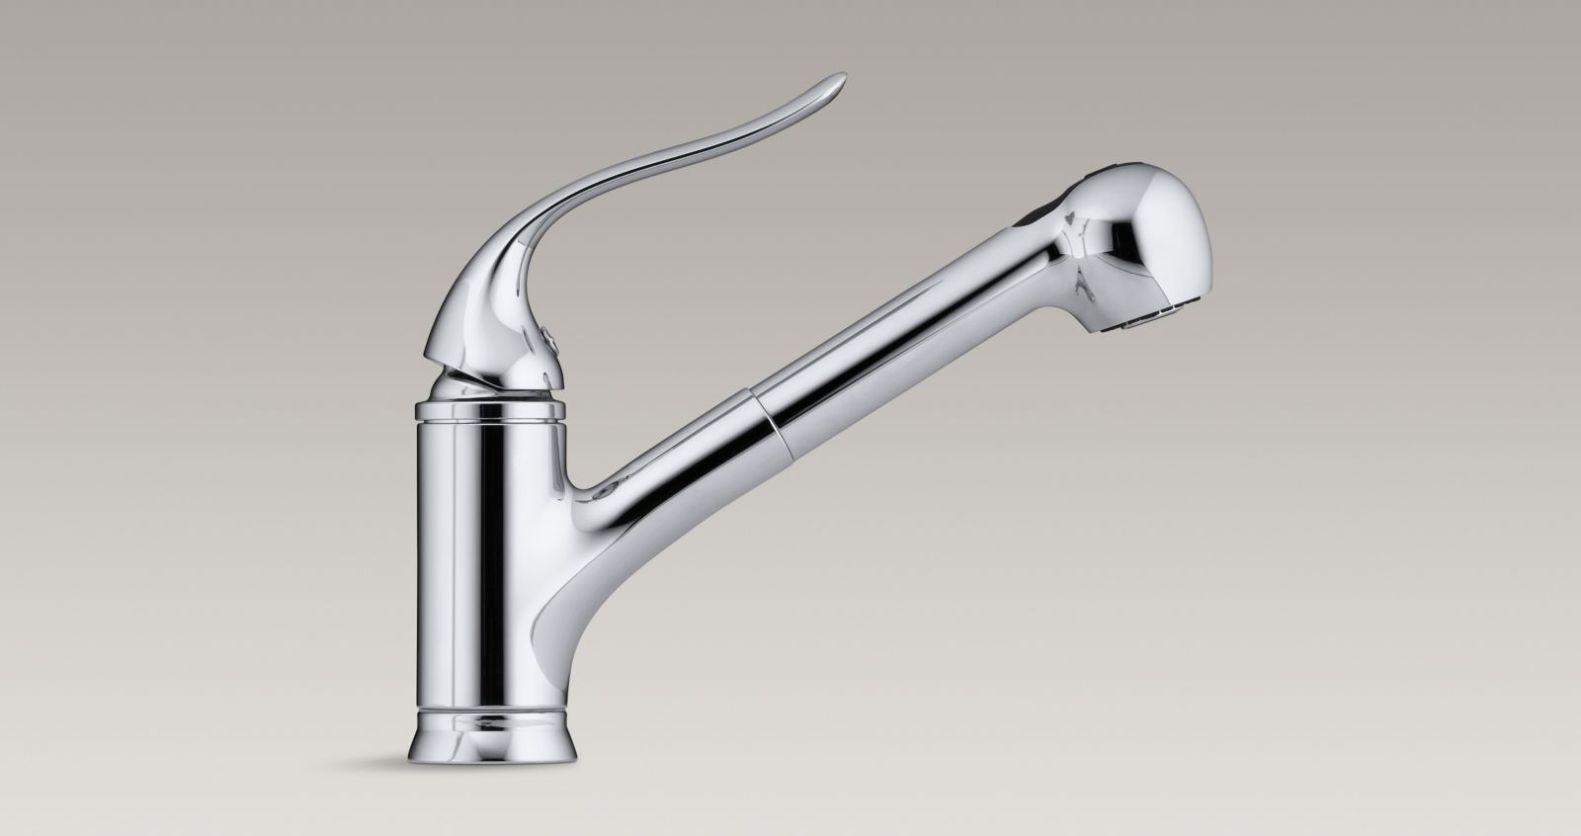 Genial Attractive Design Kohler Coralais Kitchen Faucet 4